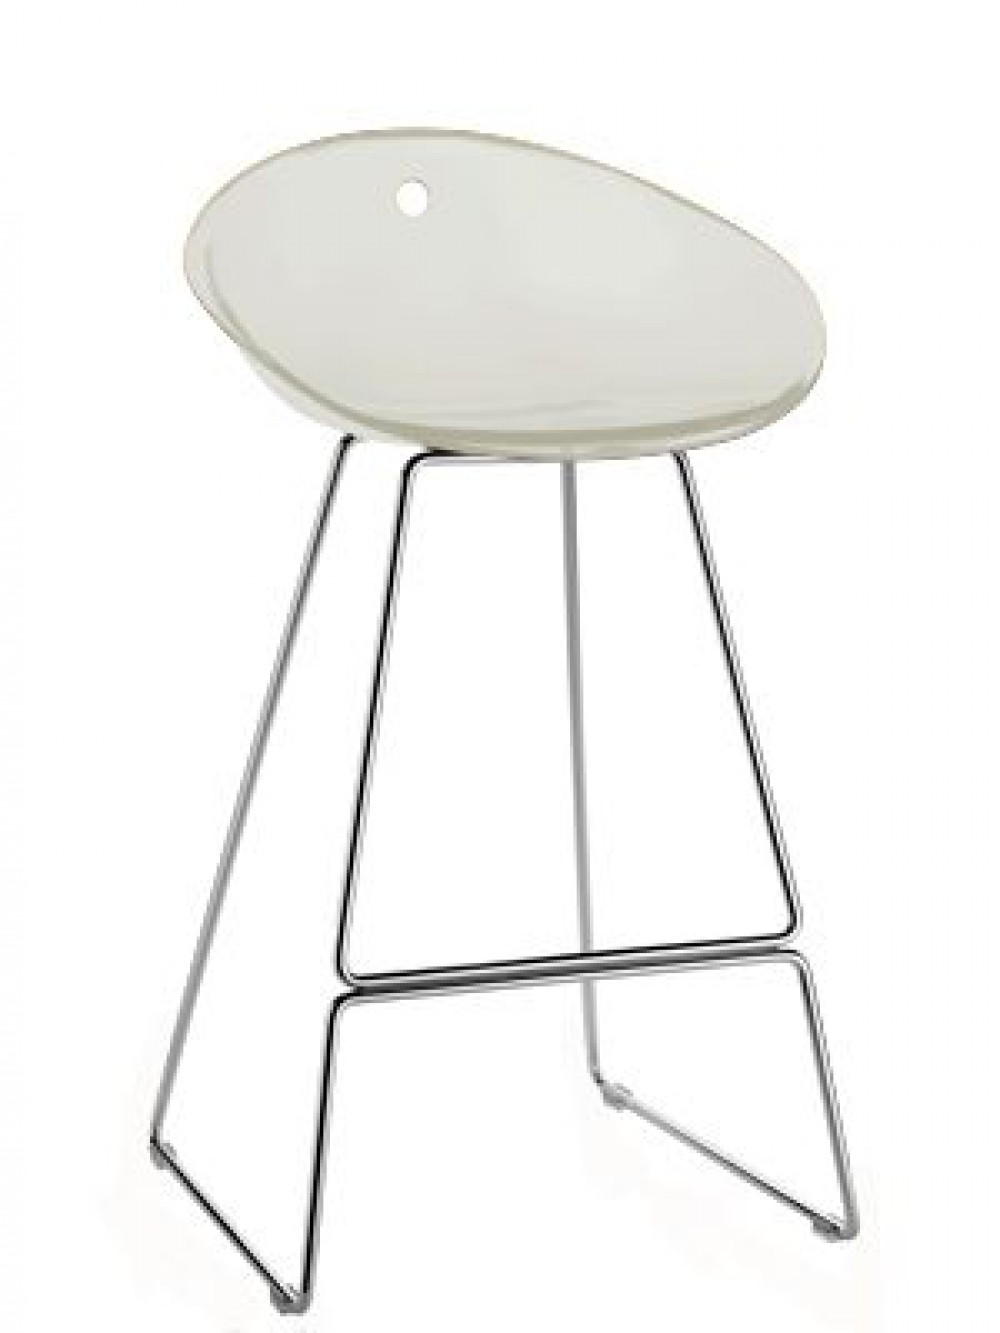 Design barhocker farbe weiss 65 cm sitzh he for Barhocker designer